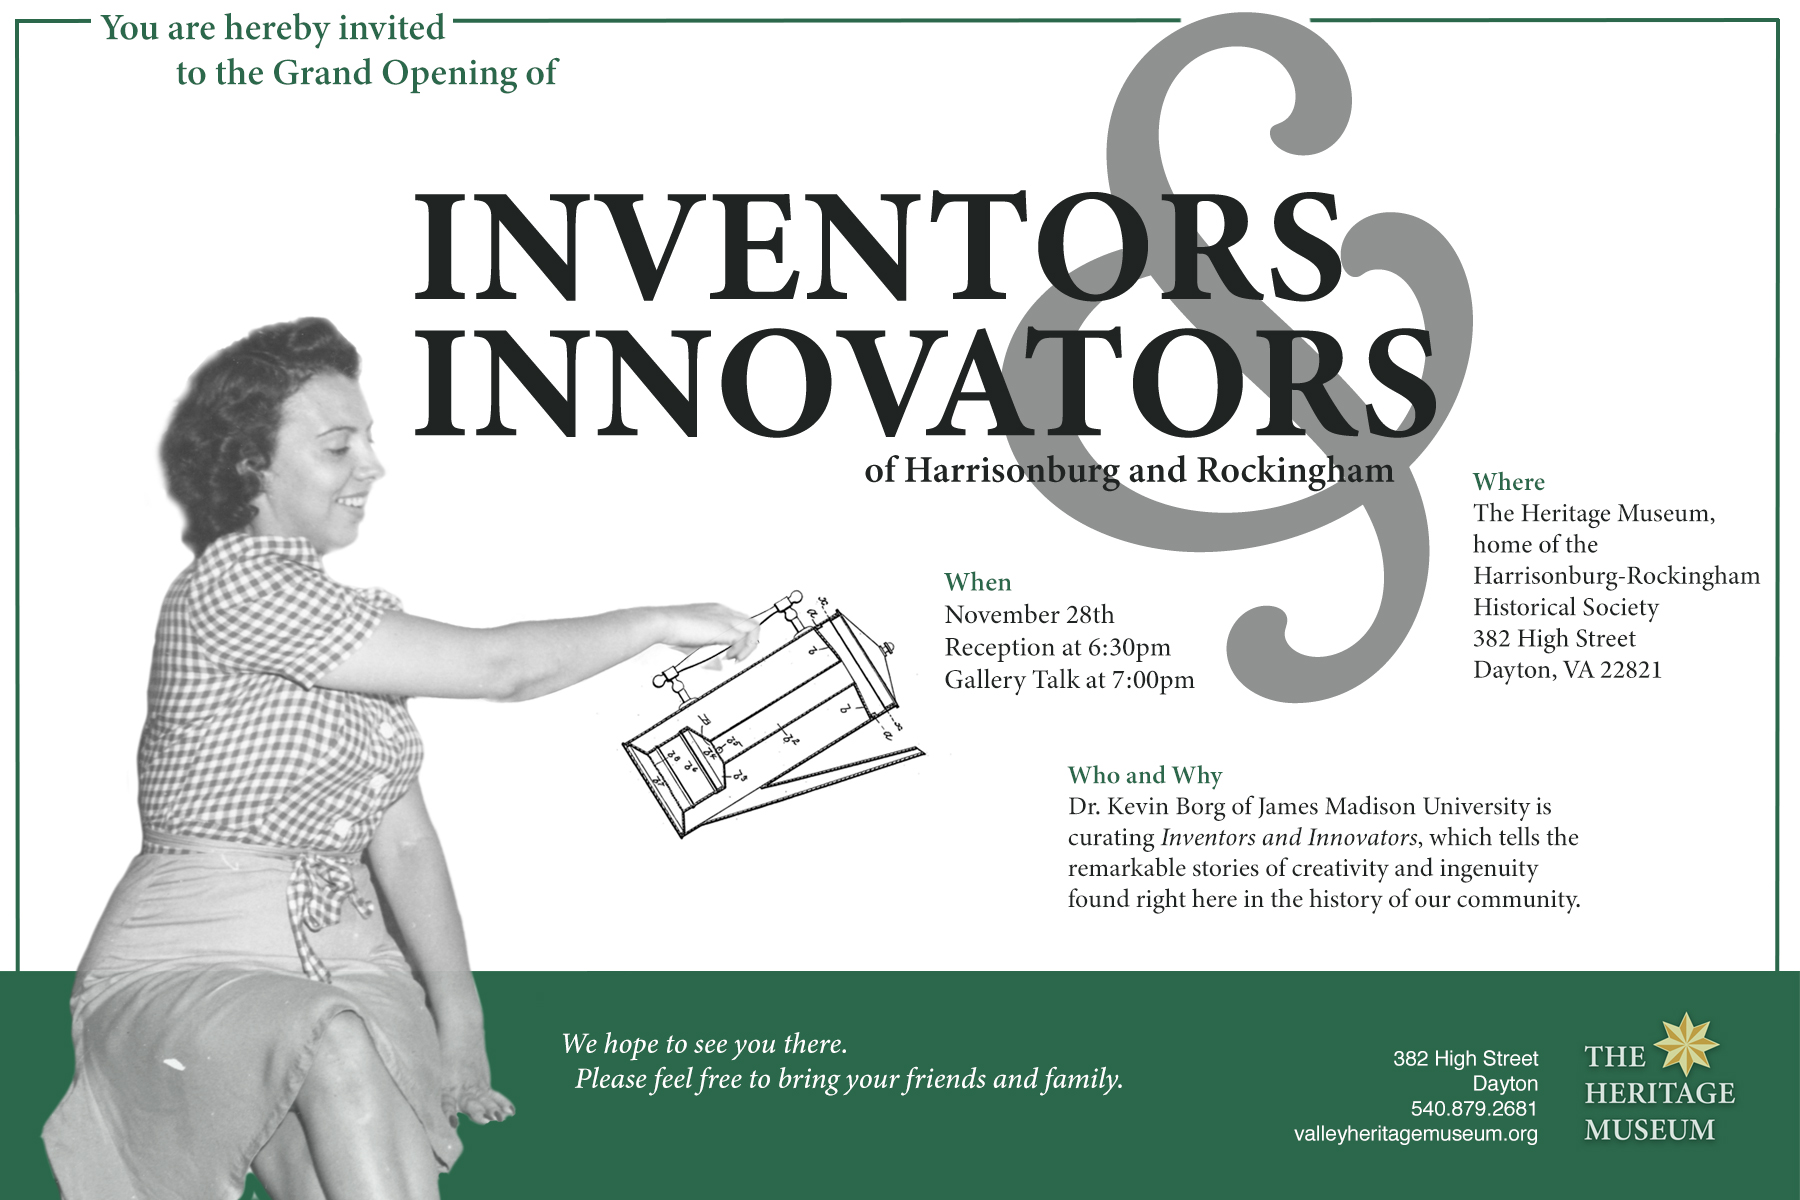 Inventors & Innovators Exhibit